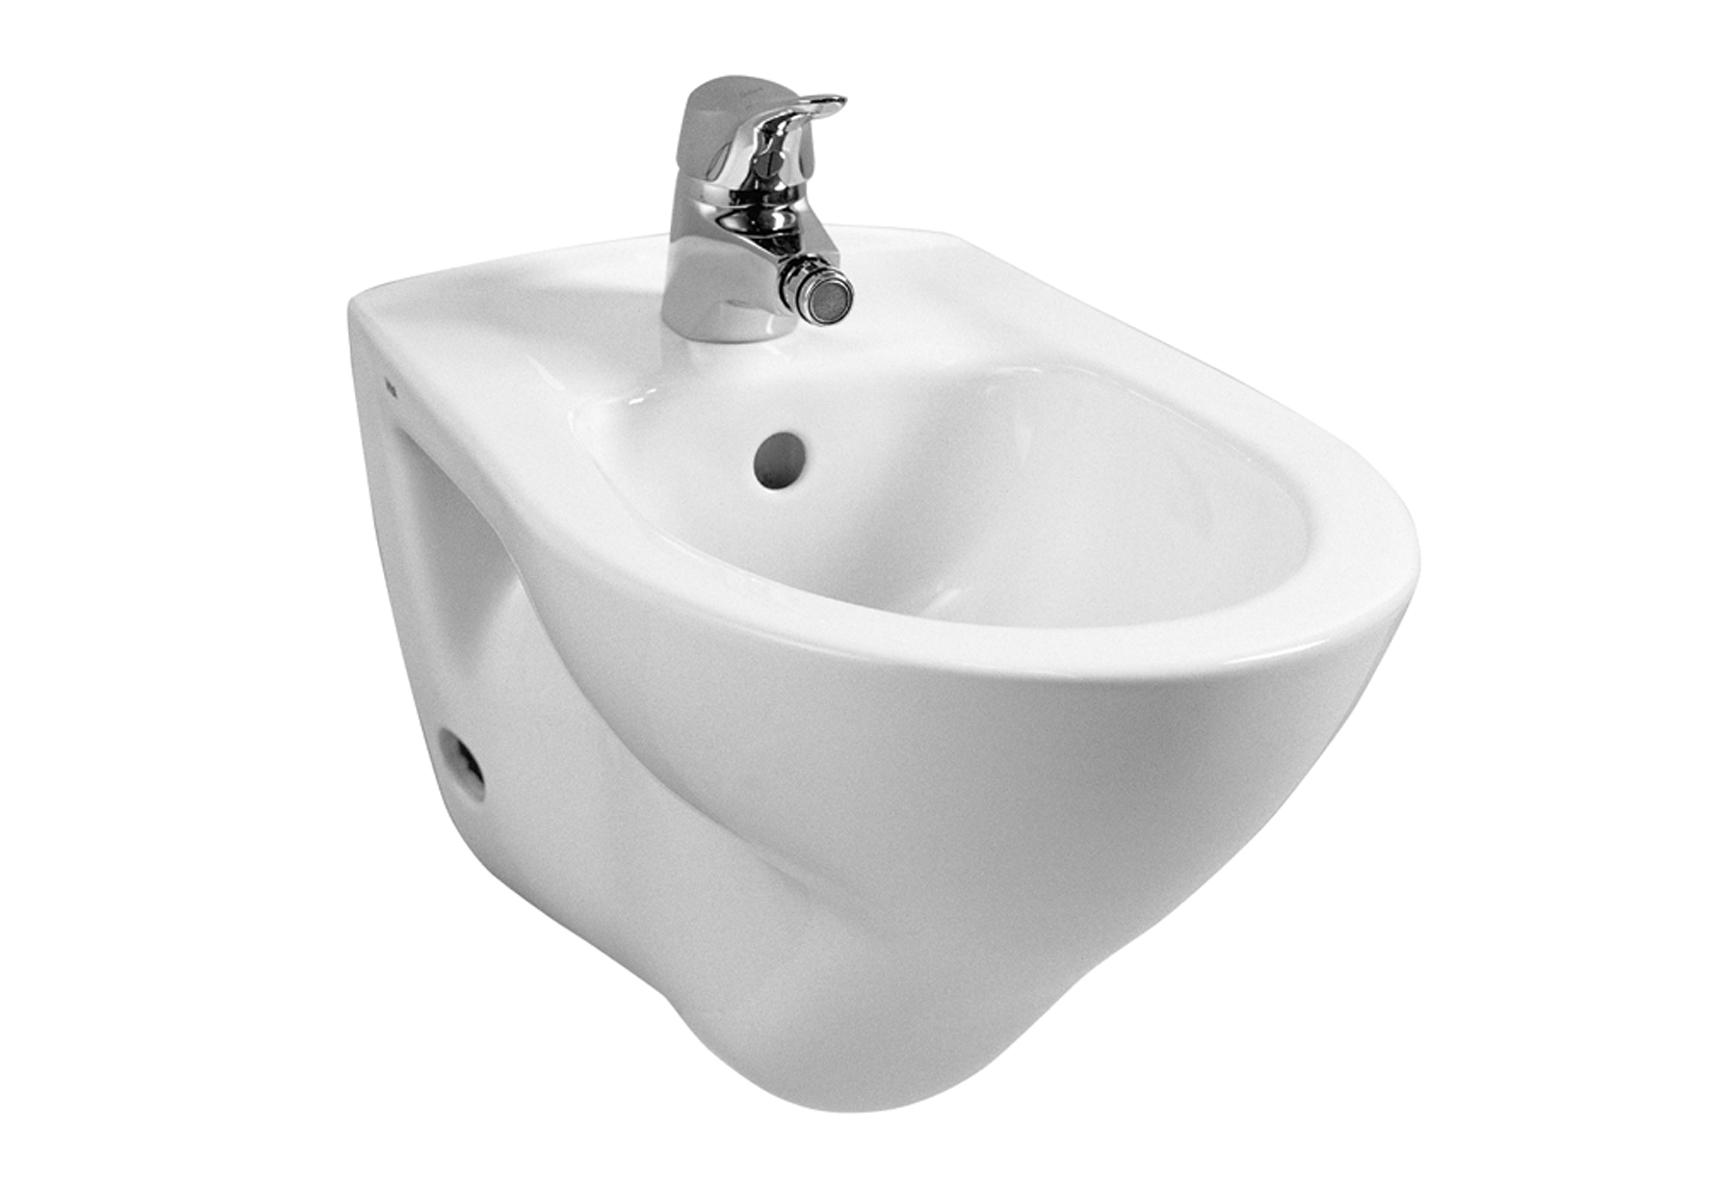 Arkitekt bidet suspendu, avec trop-plein, 1 trou de robinet central, 52 cm